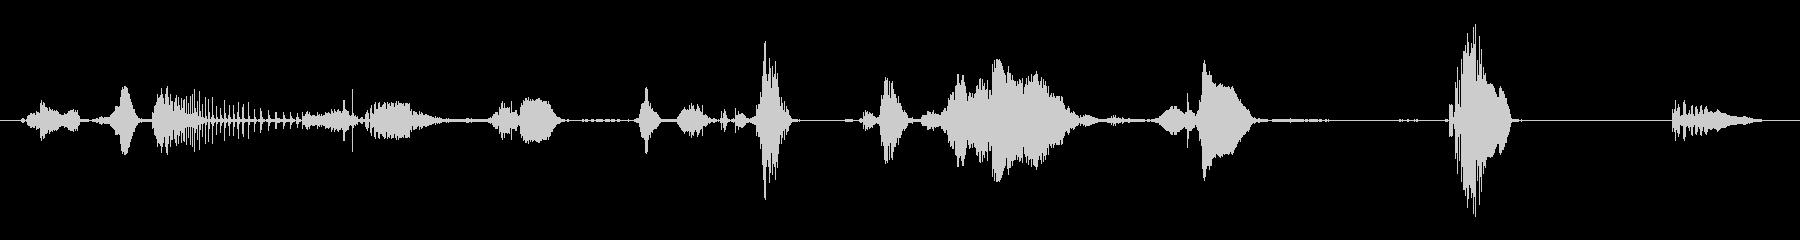 Baby B:幸せな発声の未再生の波形